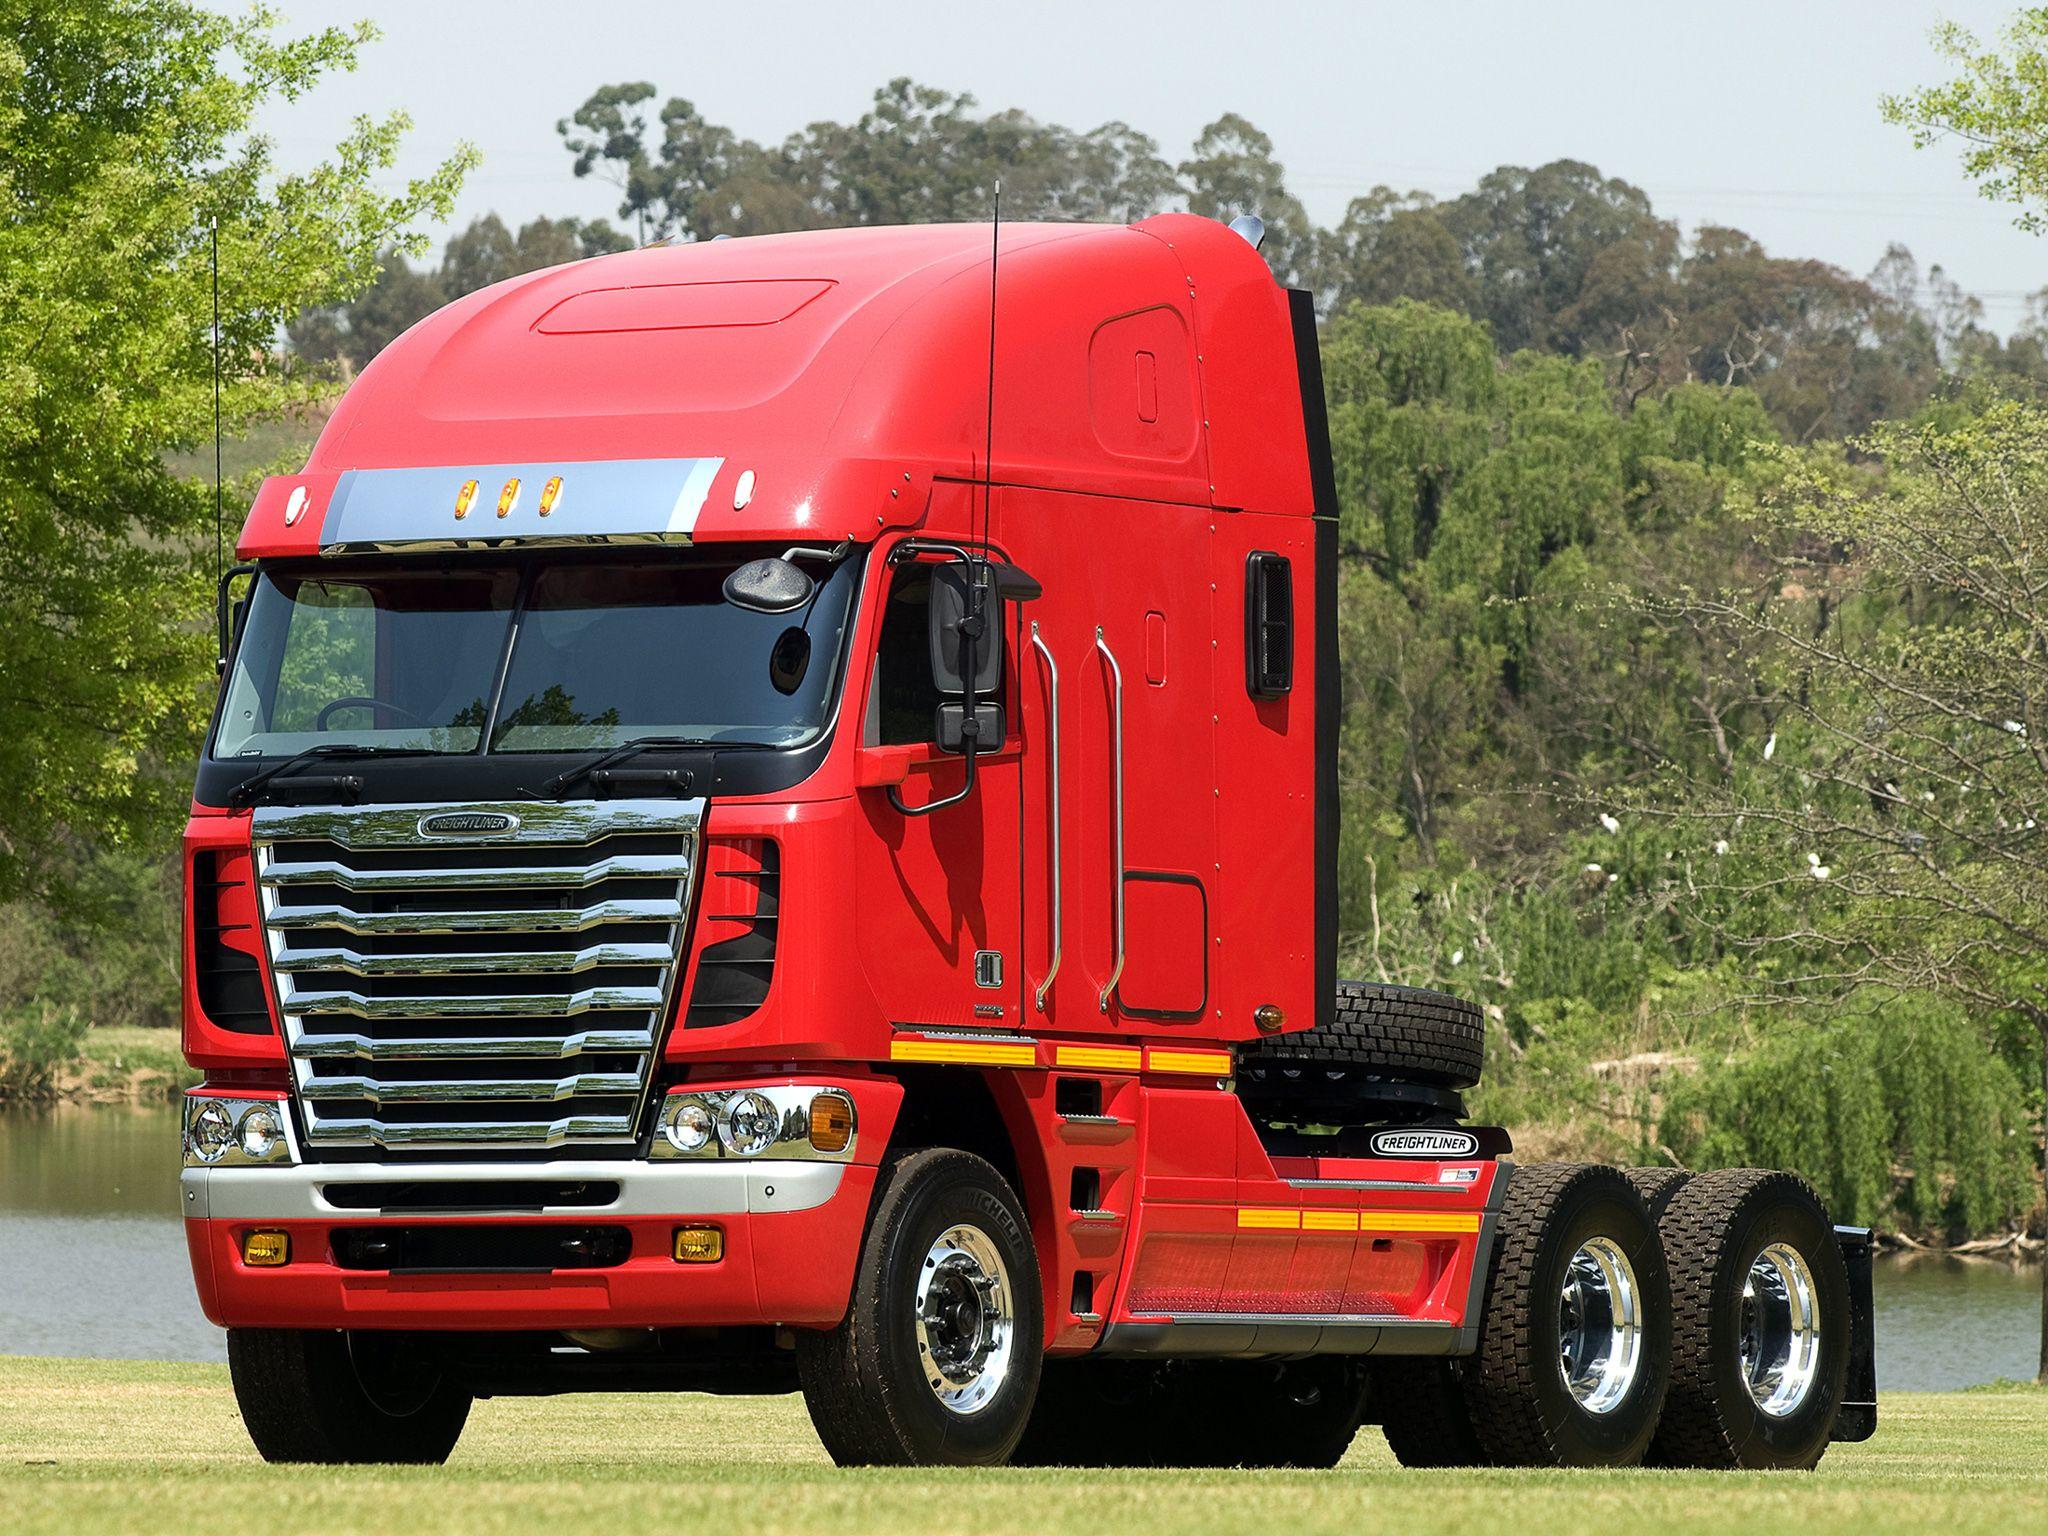 2011 Freightliner Argosy Semi Trucks Pinterest Trailer Wiring Diagram For Big Rig Custom Rigs Widescreen Wallpaper Tractors